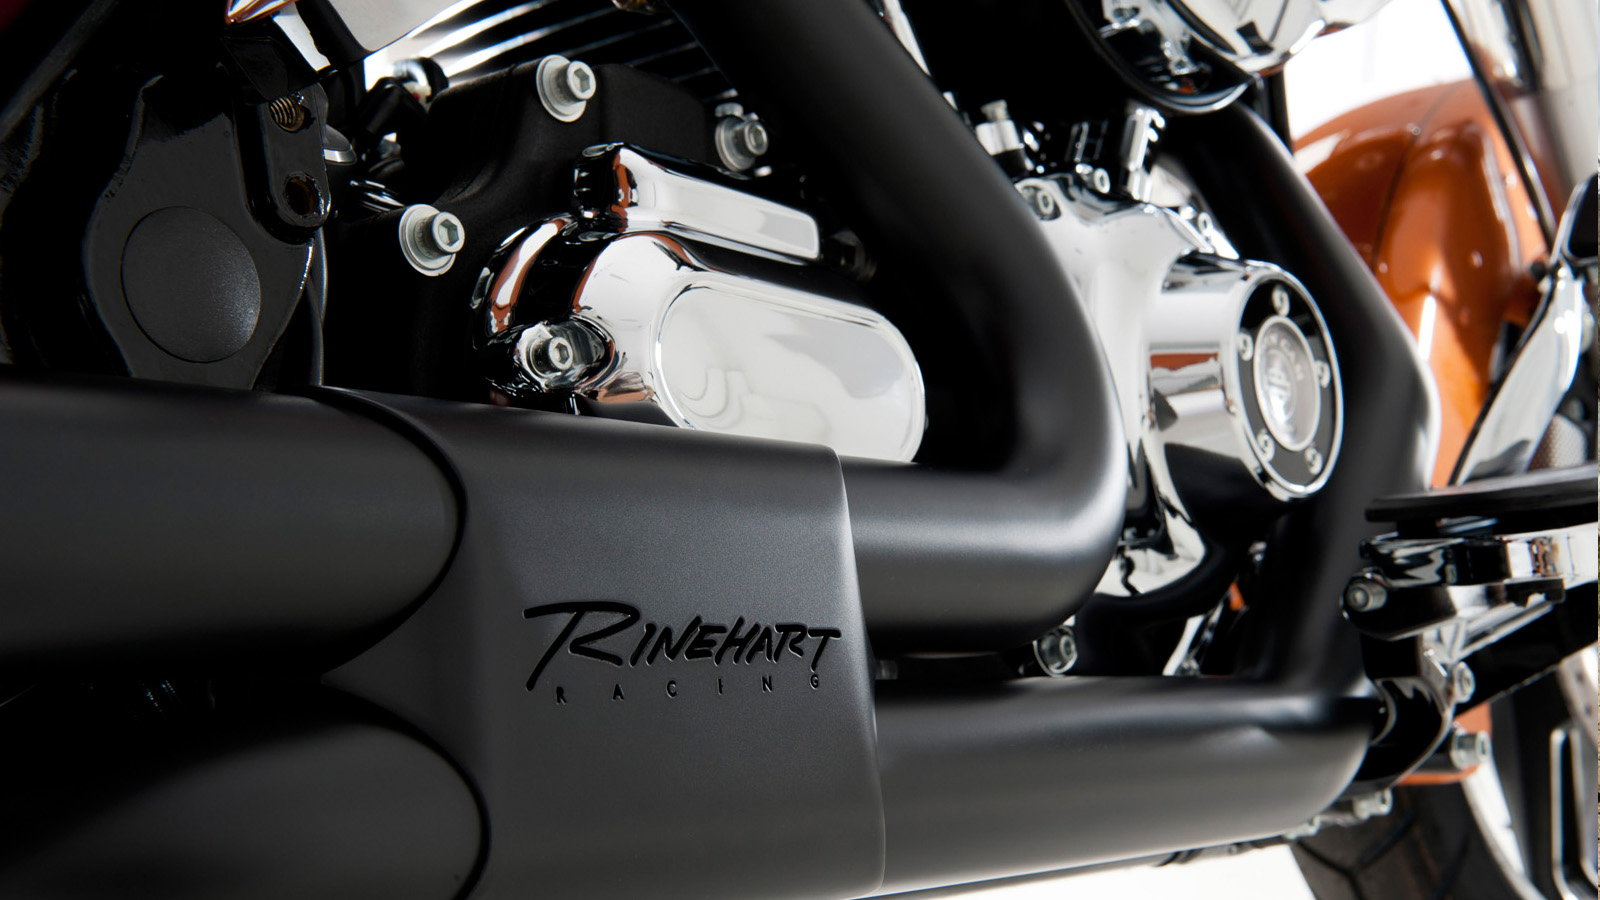 rinehart racing slimline exhaust system